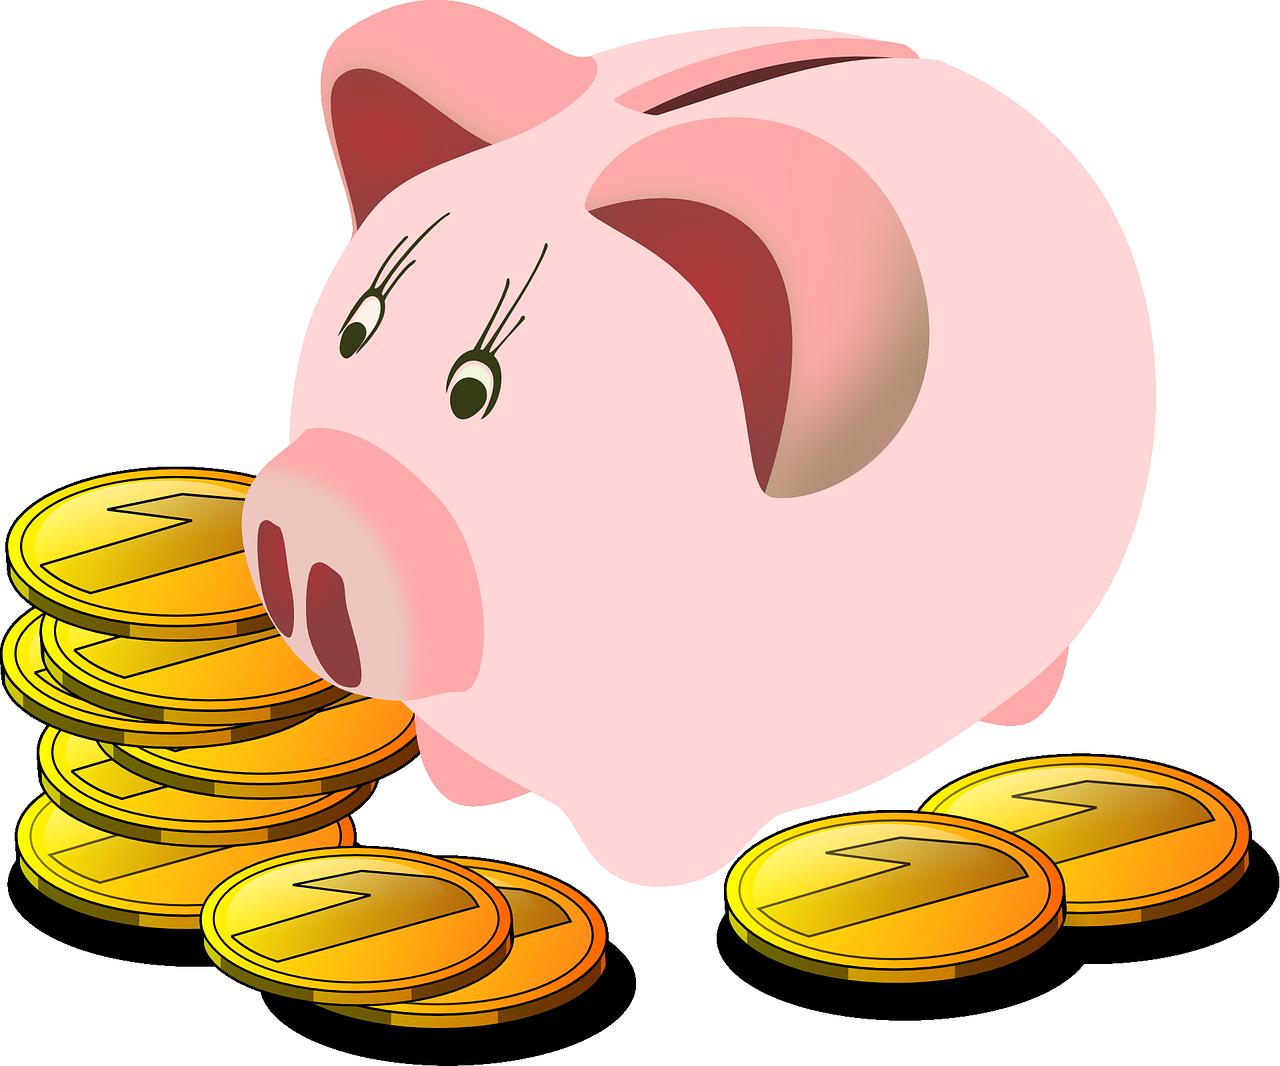 garantie ondernemingsfinanciering (GO)